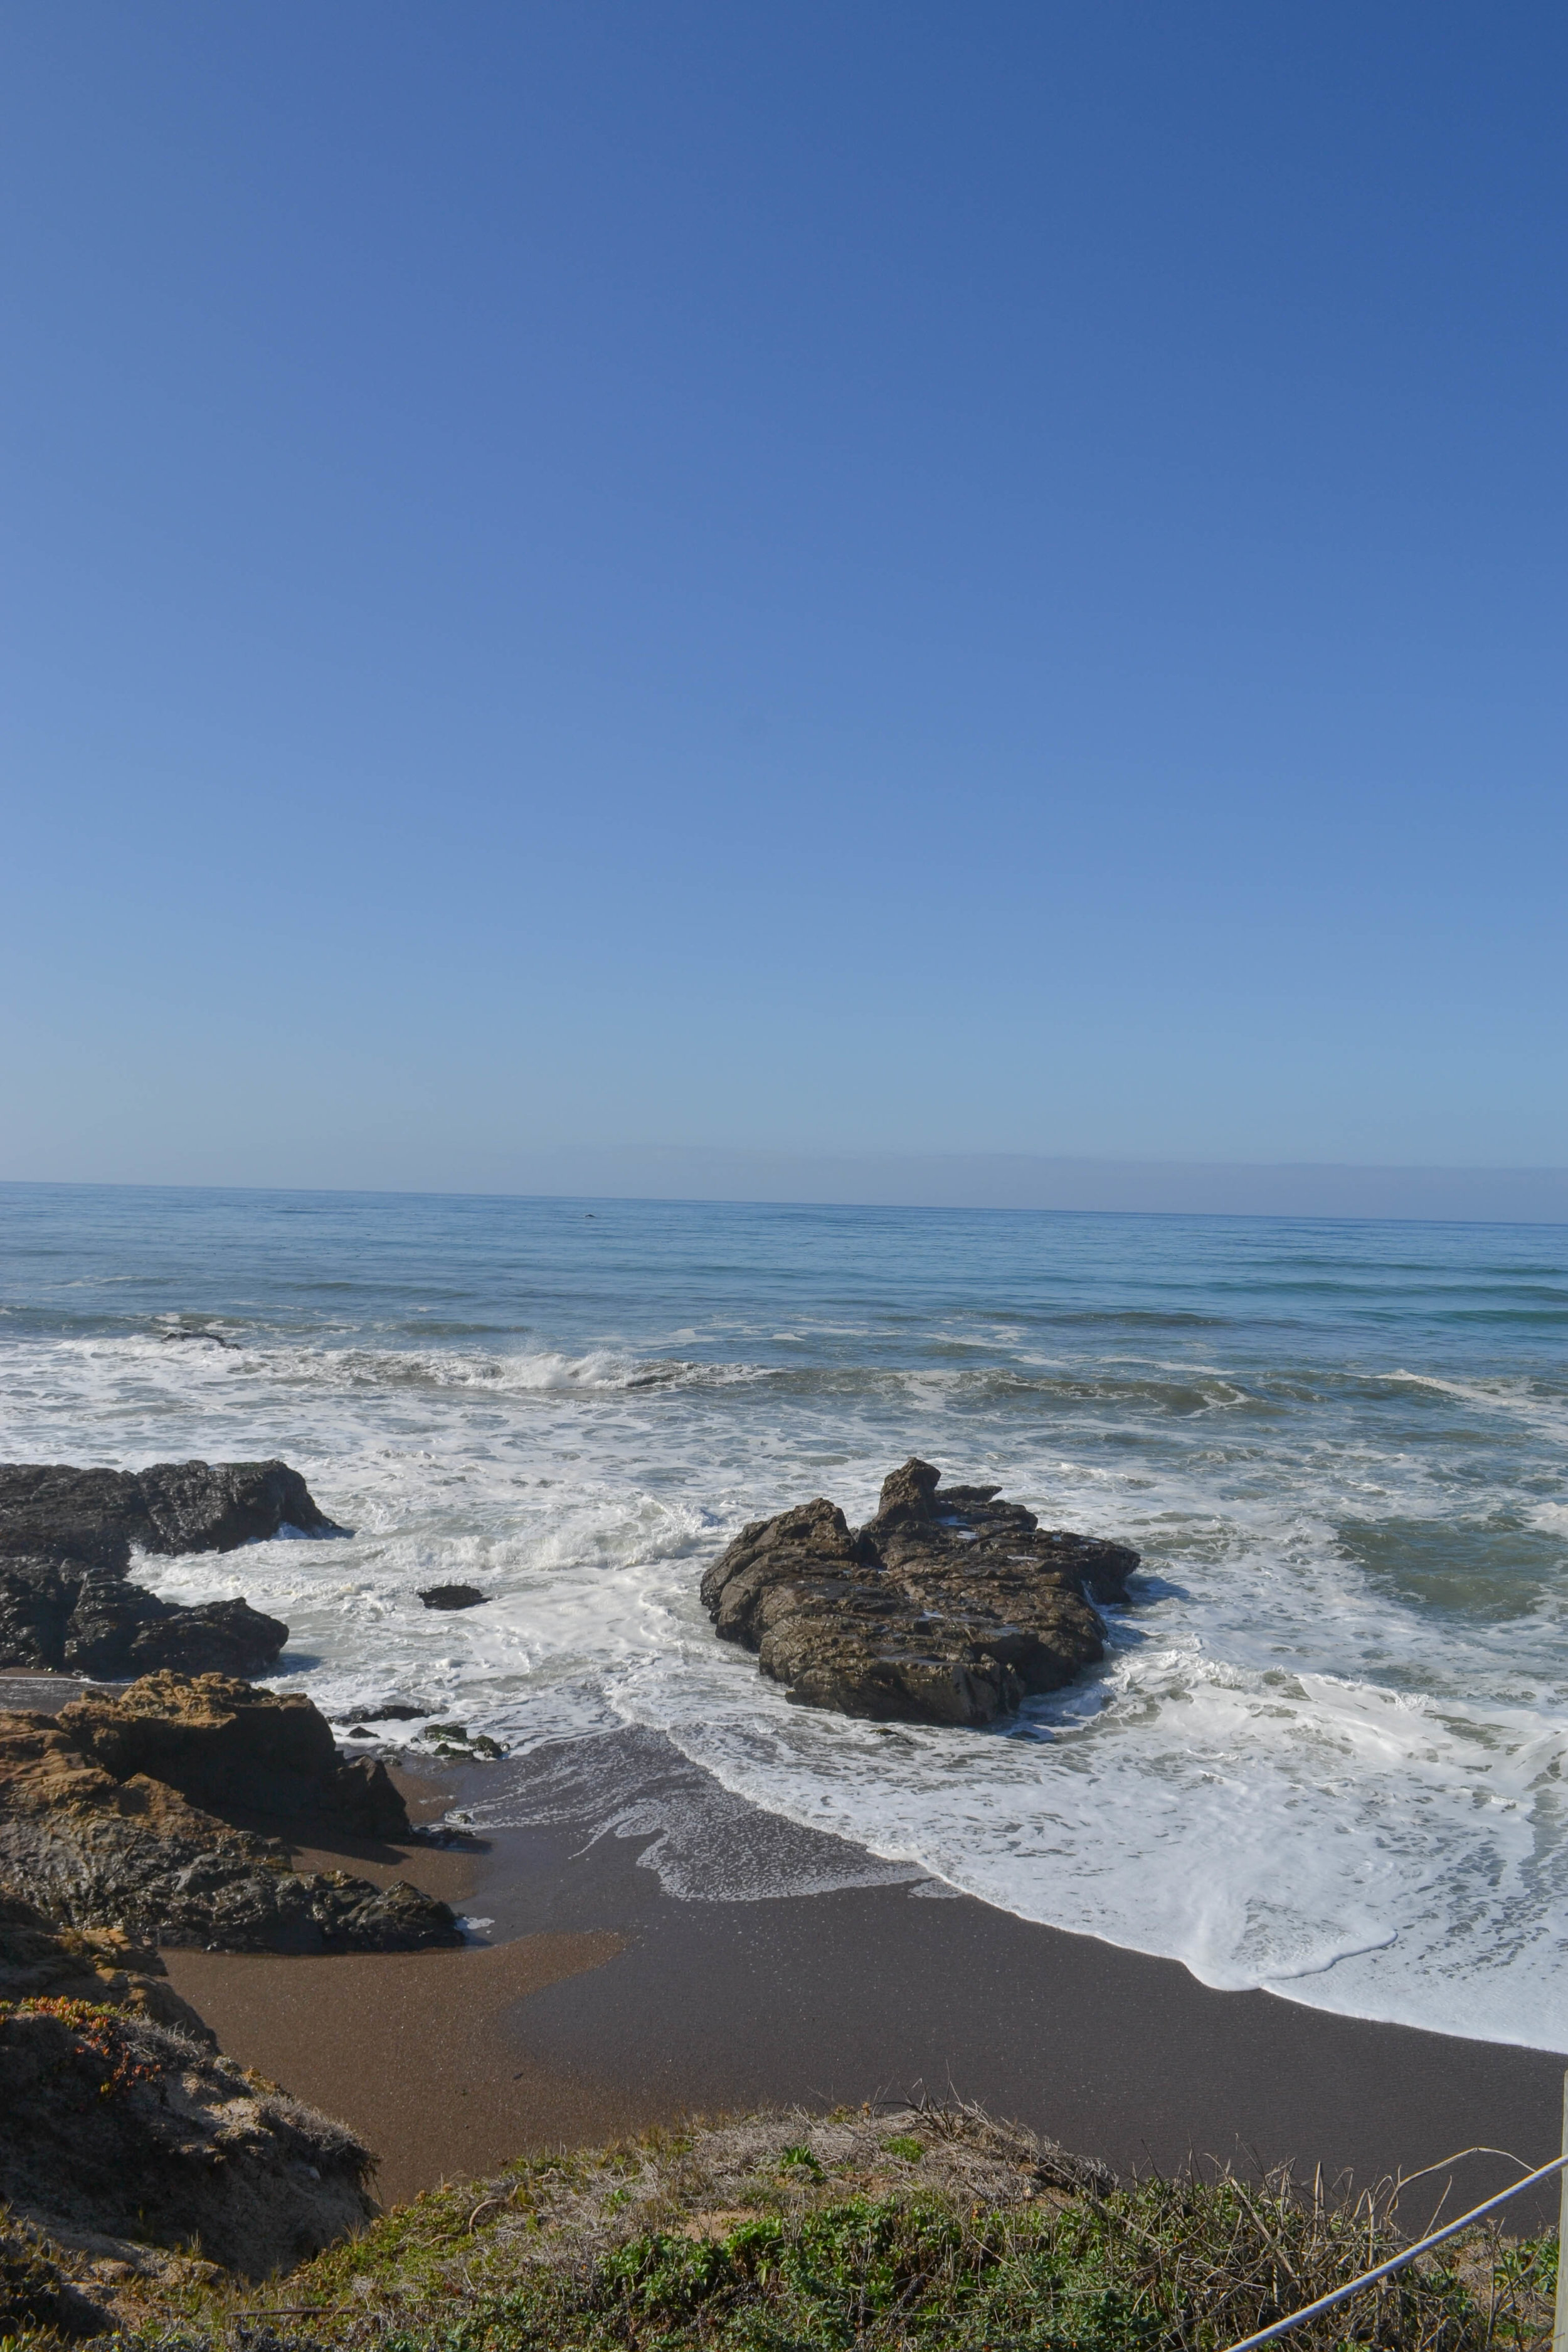 bri rinehart; photography; california; cambria